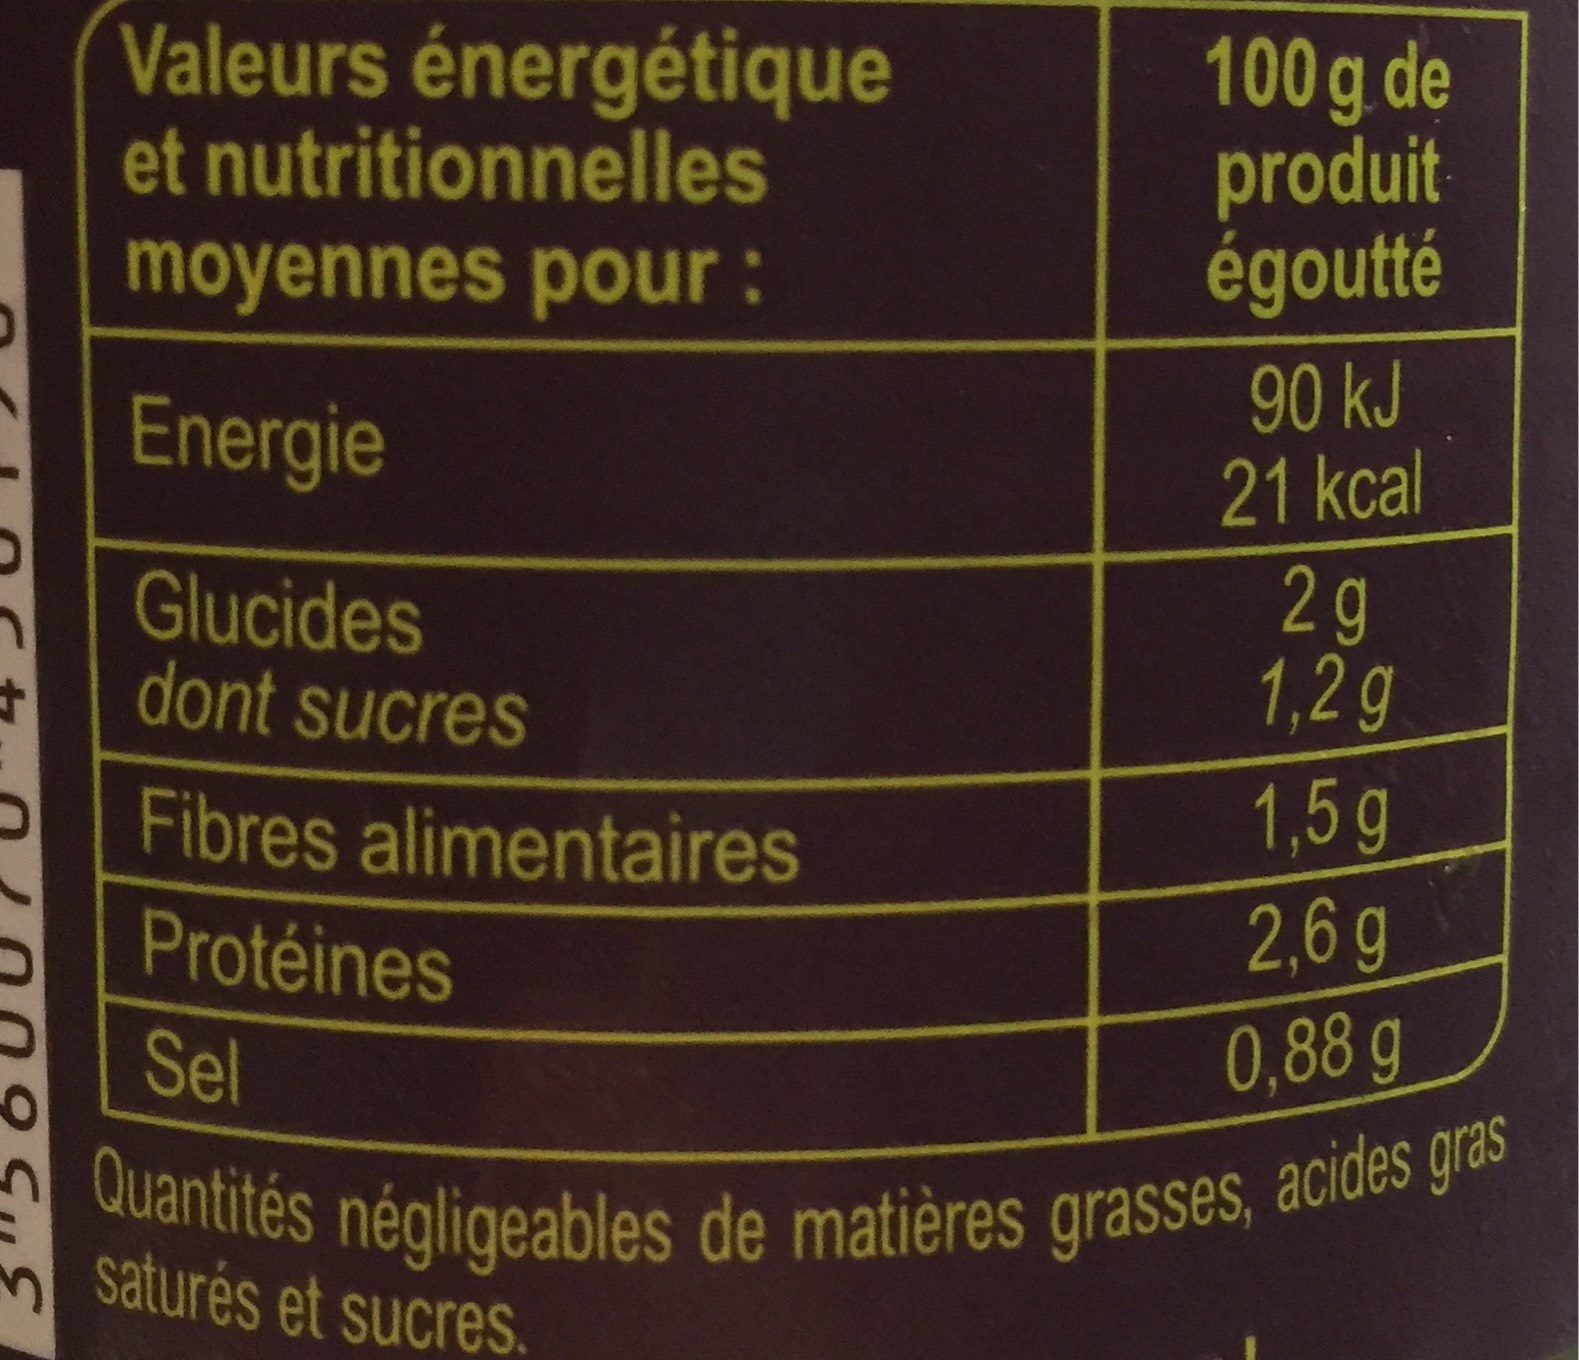 Pointes  d'asperges  vertes - Informació nutricional - fr